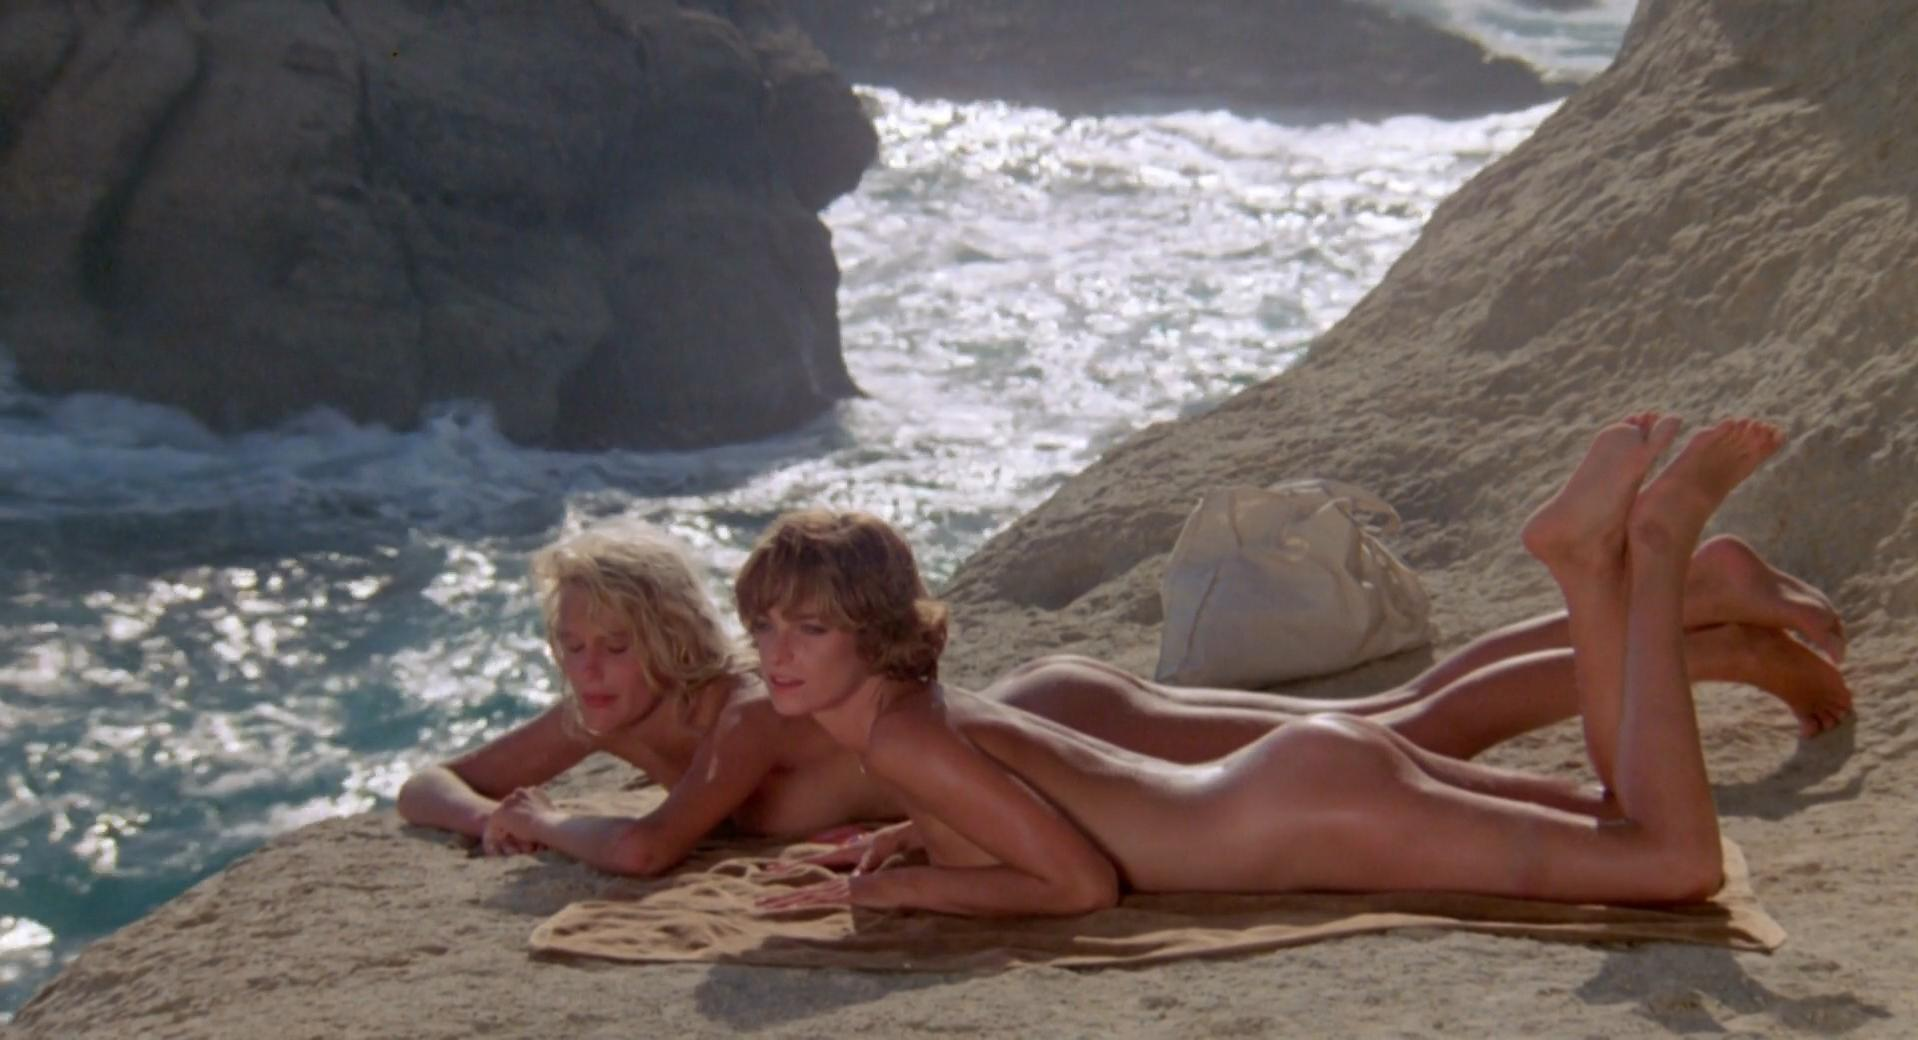 Naked emelie rydberg in paradise hotel sweden ancensored